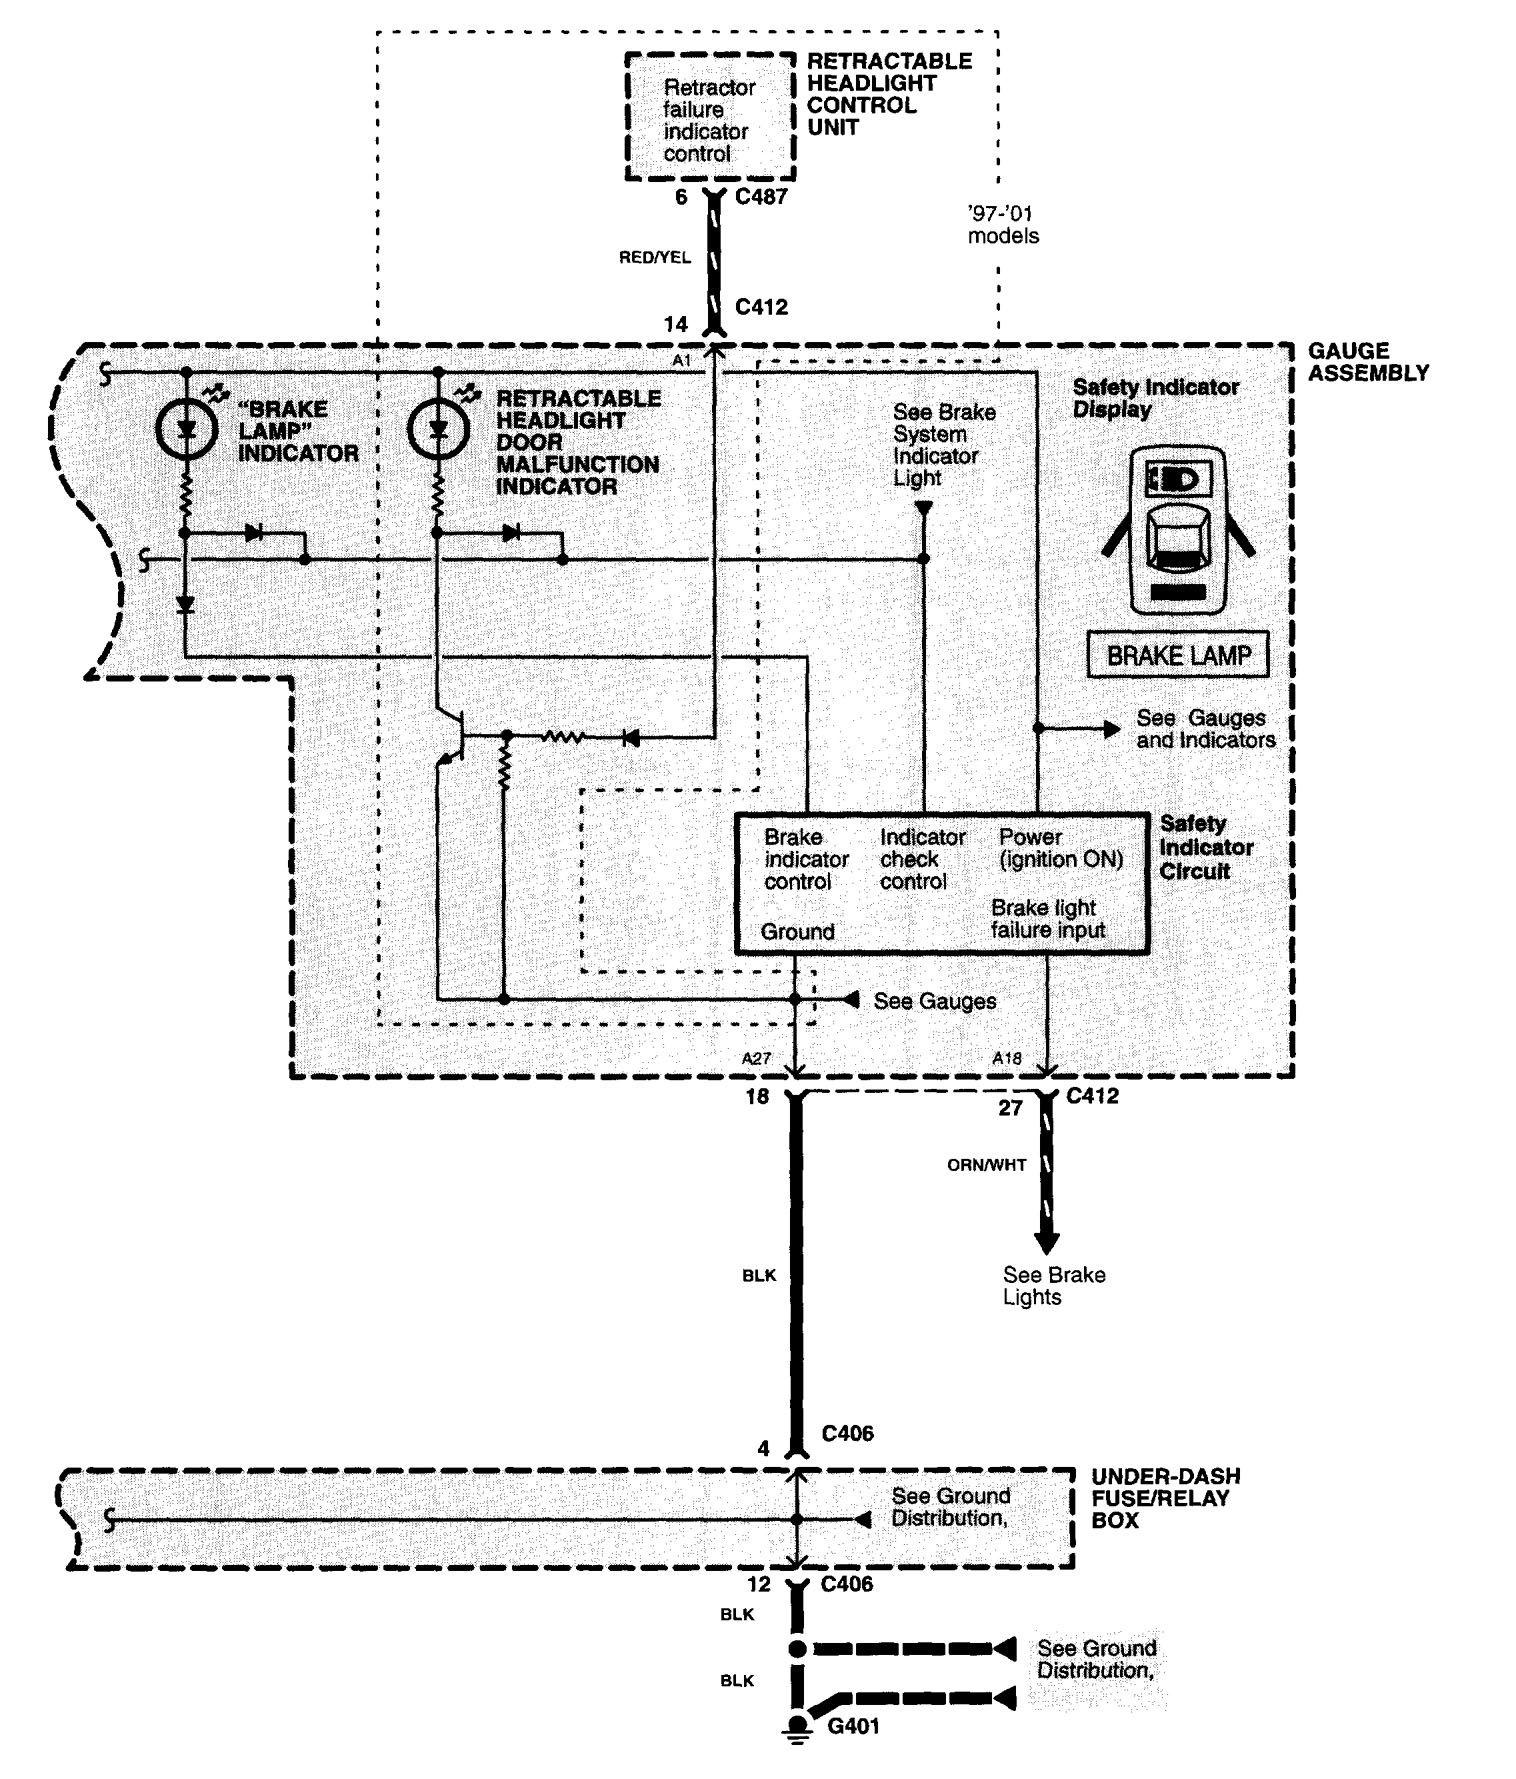 Acura Nsx 1997 2004 Wiring Diagrams Warning Indicators Dodge Caravan Tail Light Diagram